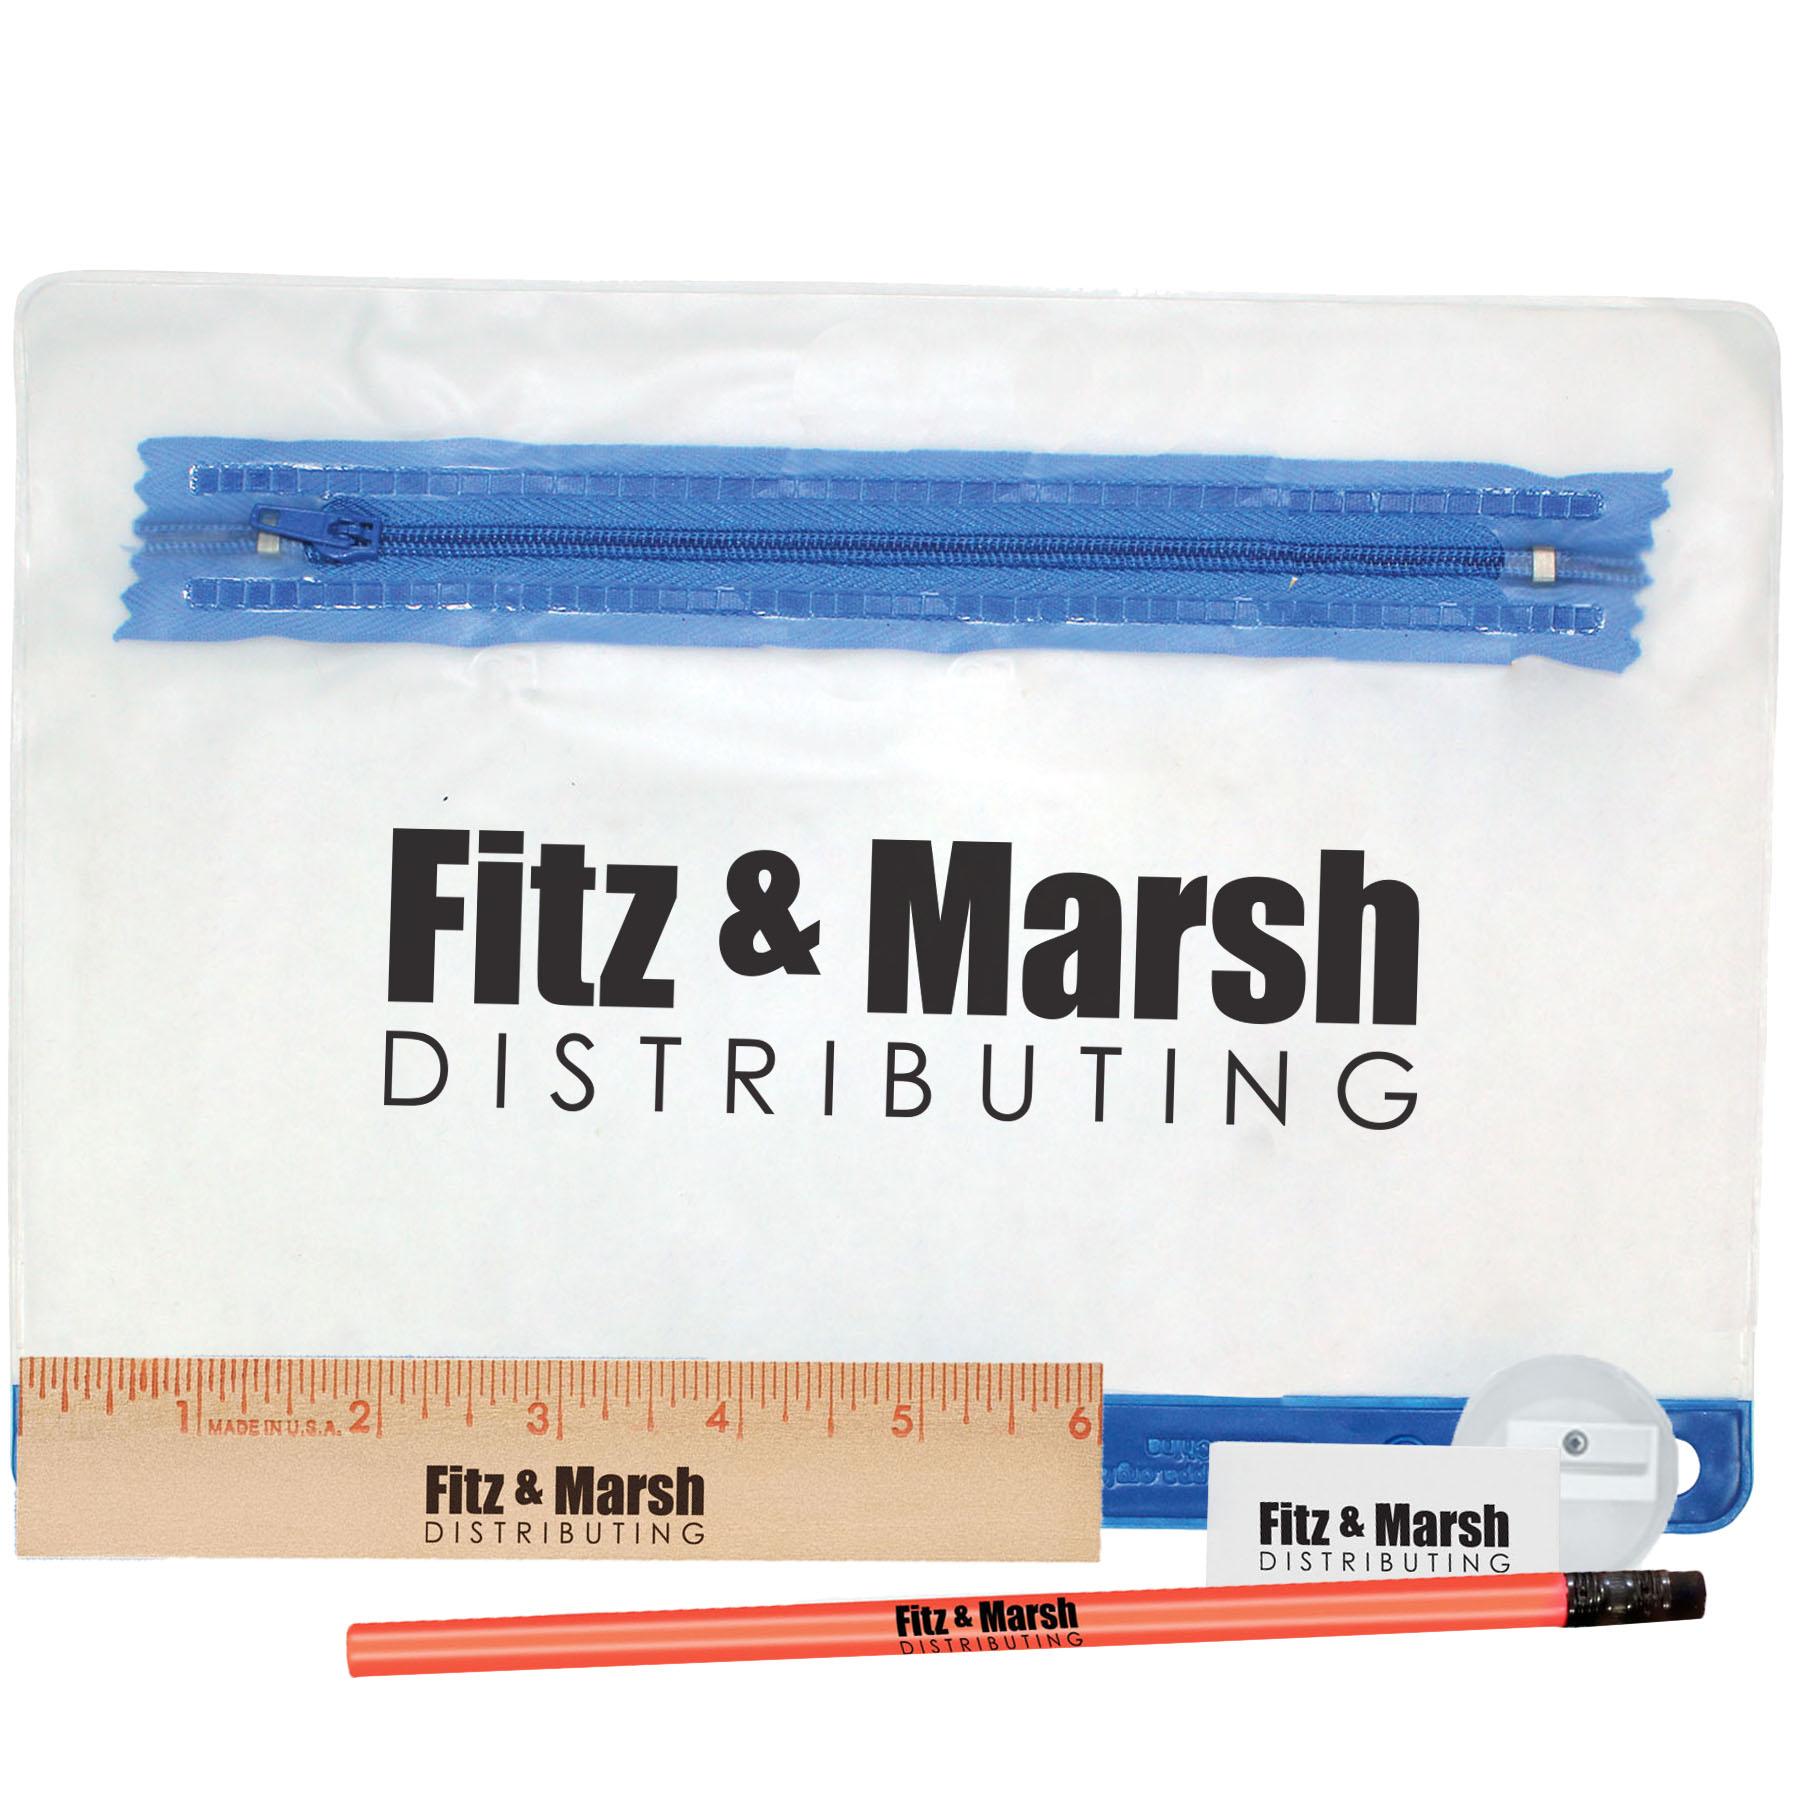 Notebook Mate School Kits II w/ Wooden Ruler